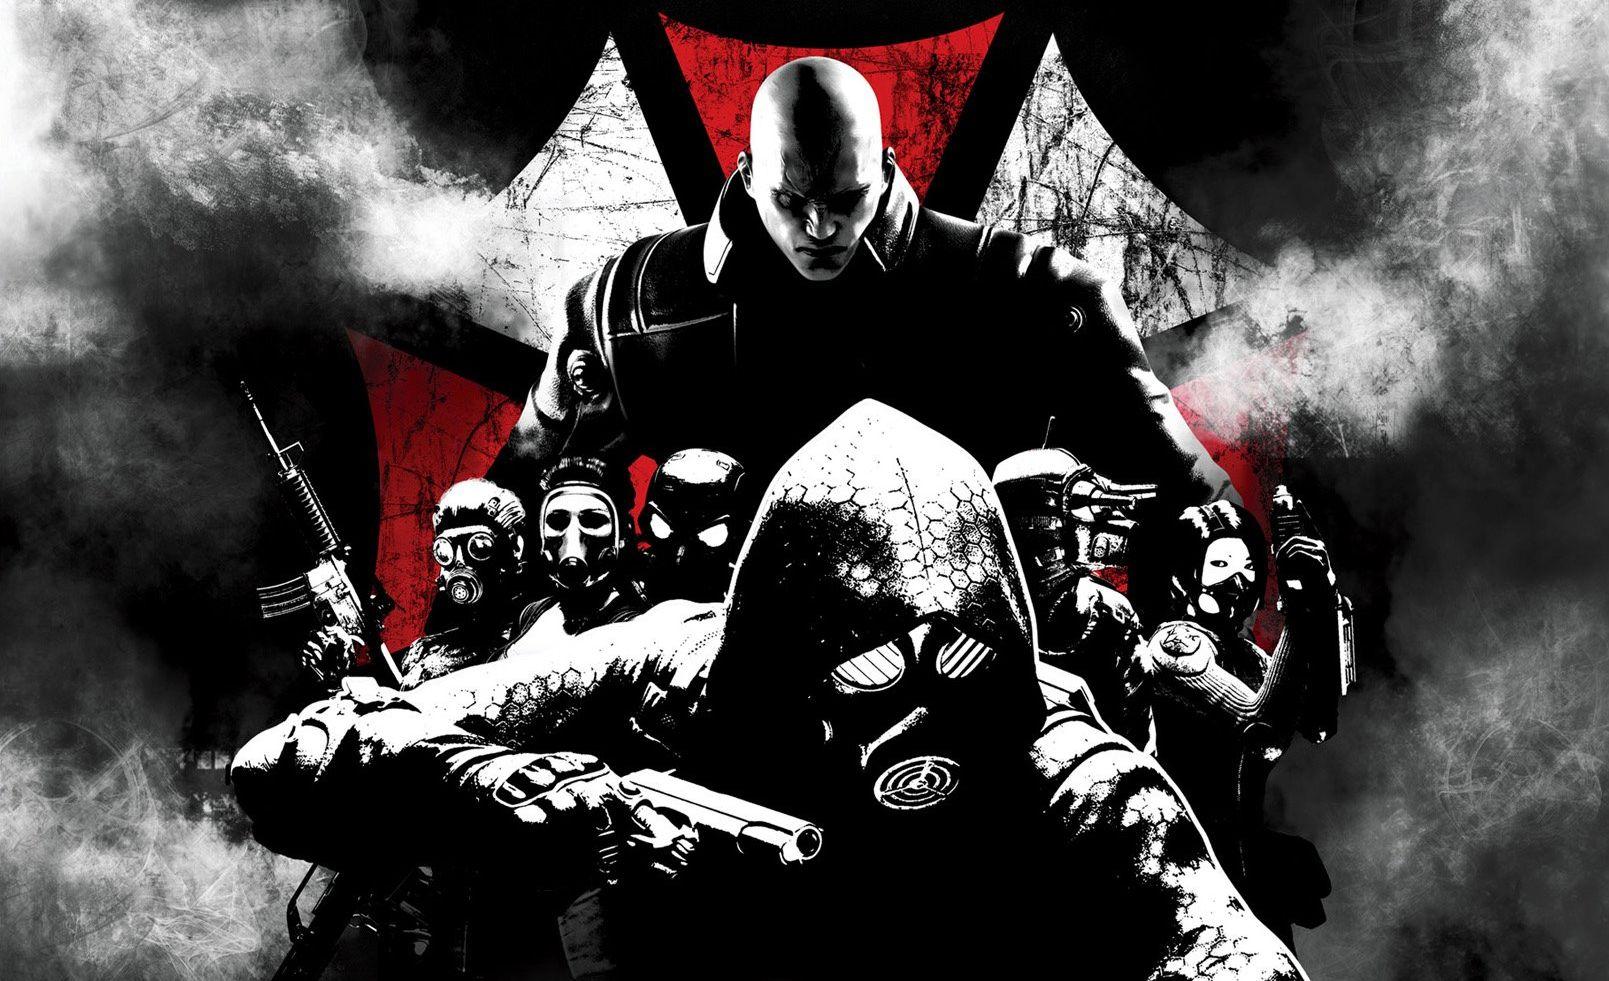 Resident Evil: Operation Raccoon City | Nemesis muestra su feo